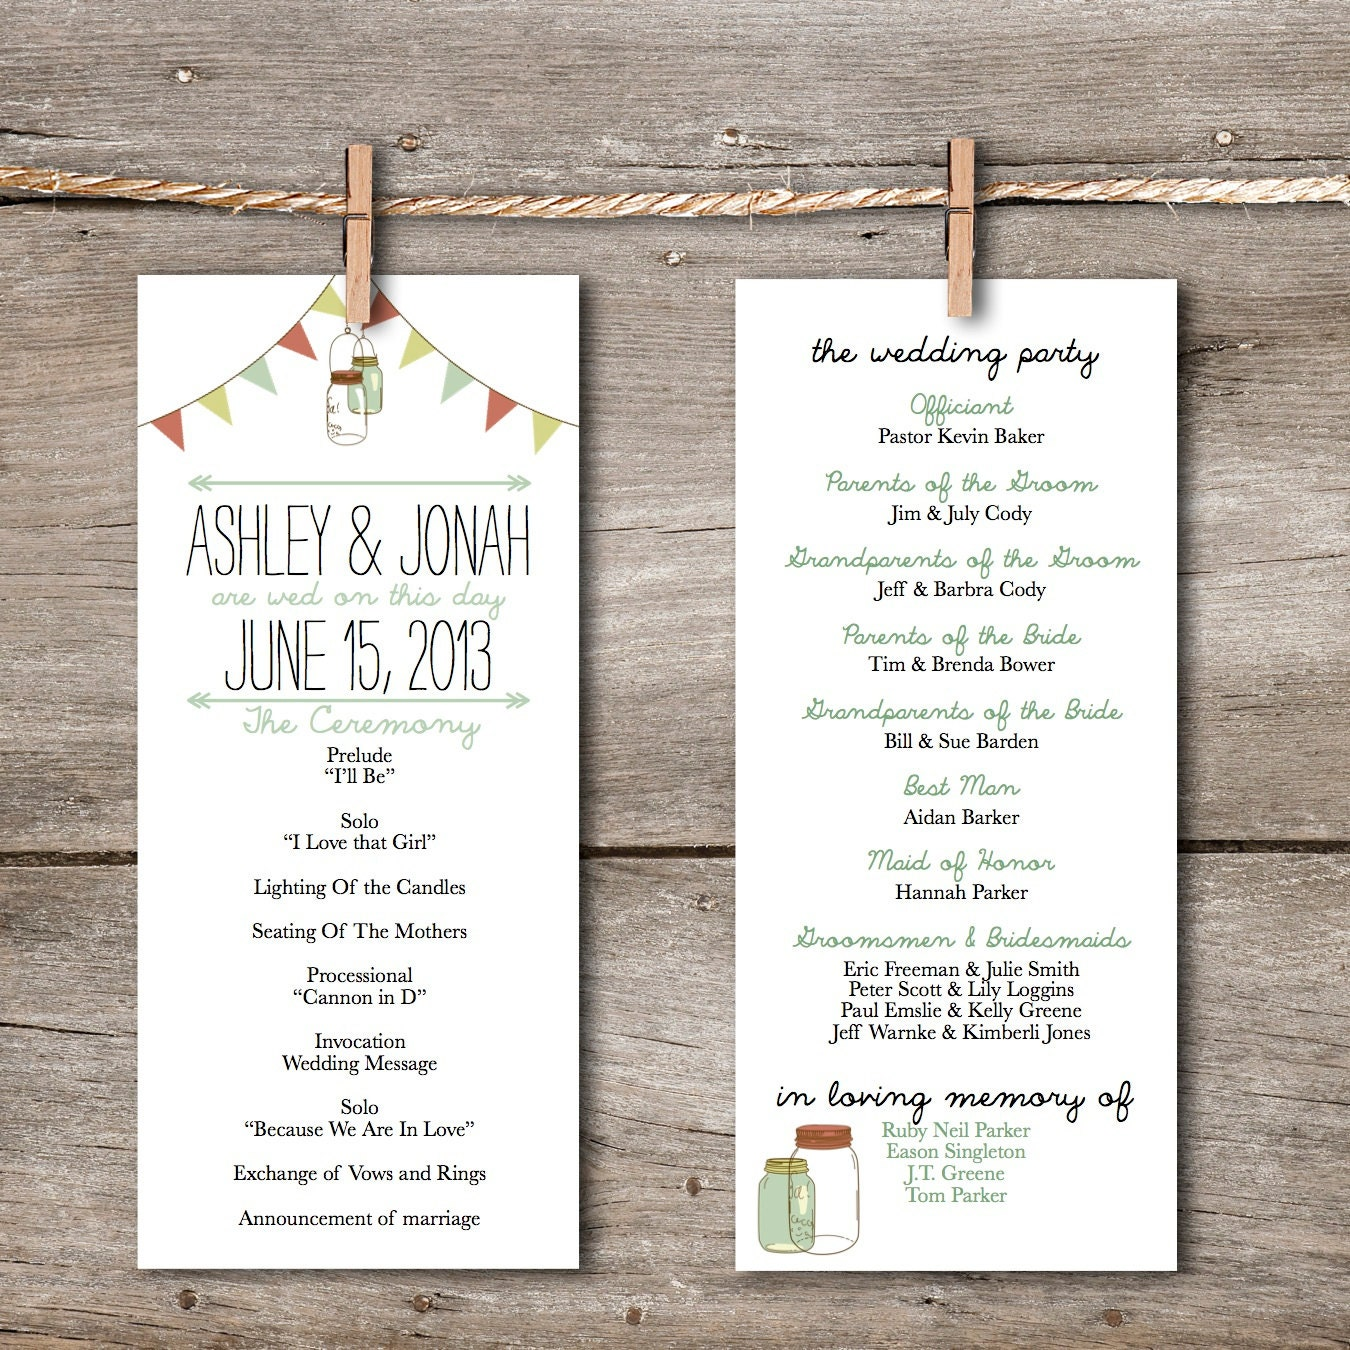 Https Www Etsy Com Listing 114498762 Printable Wedding Program Rustic Vintage